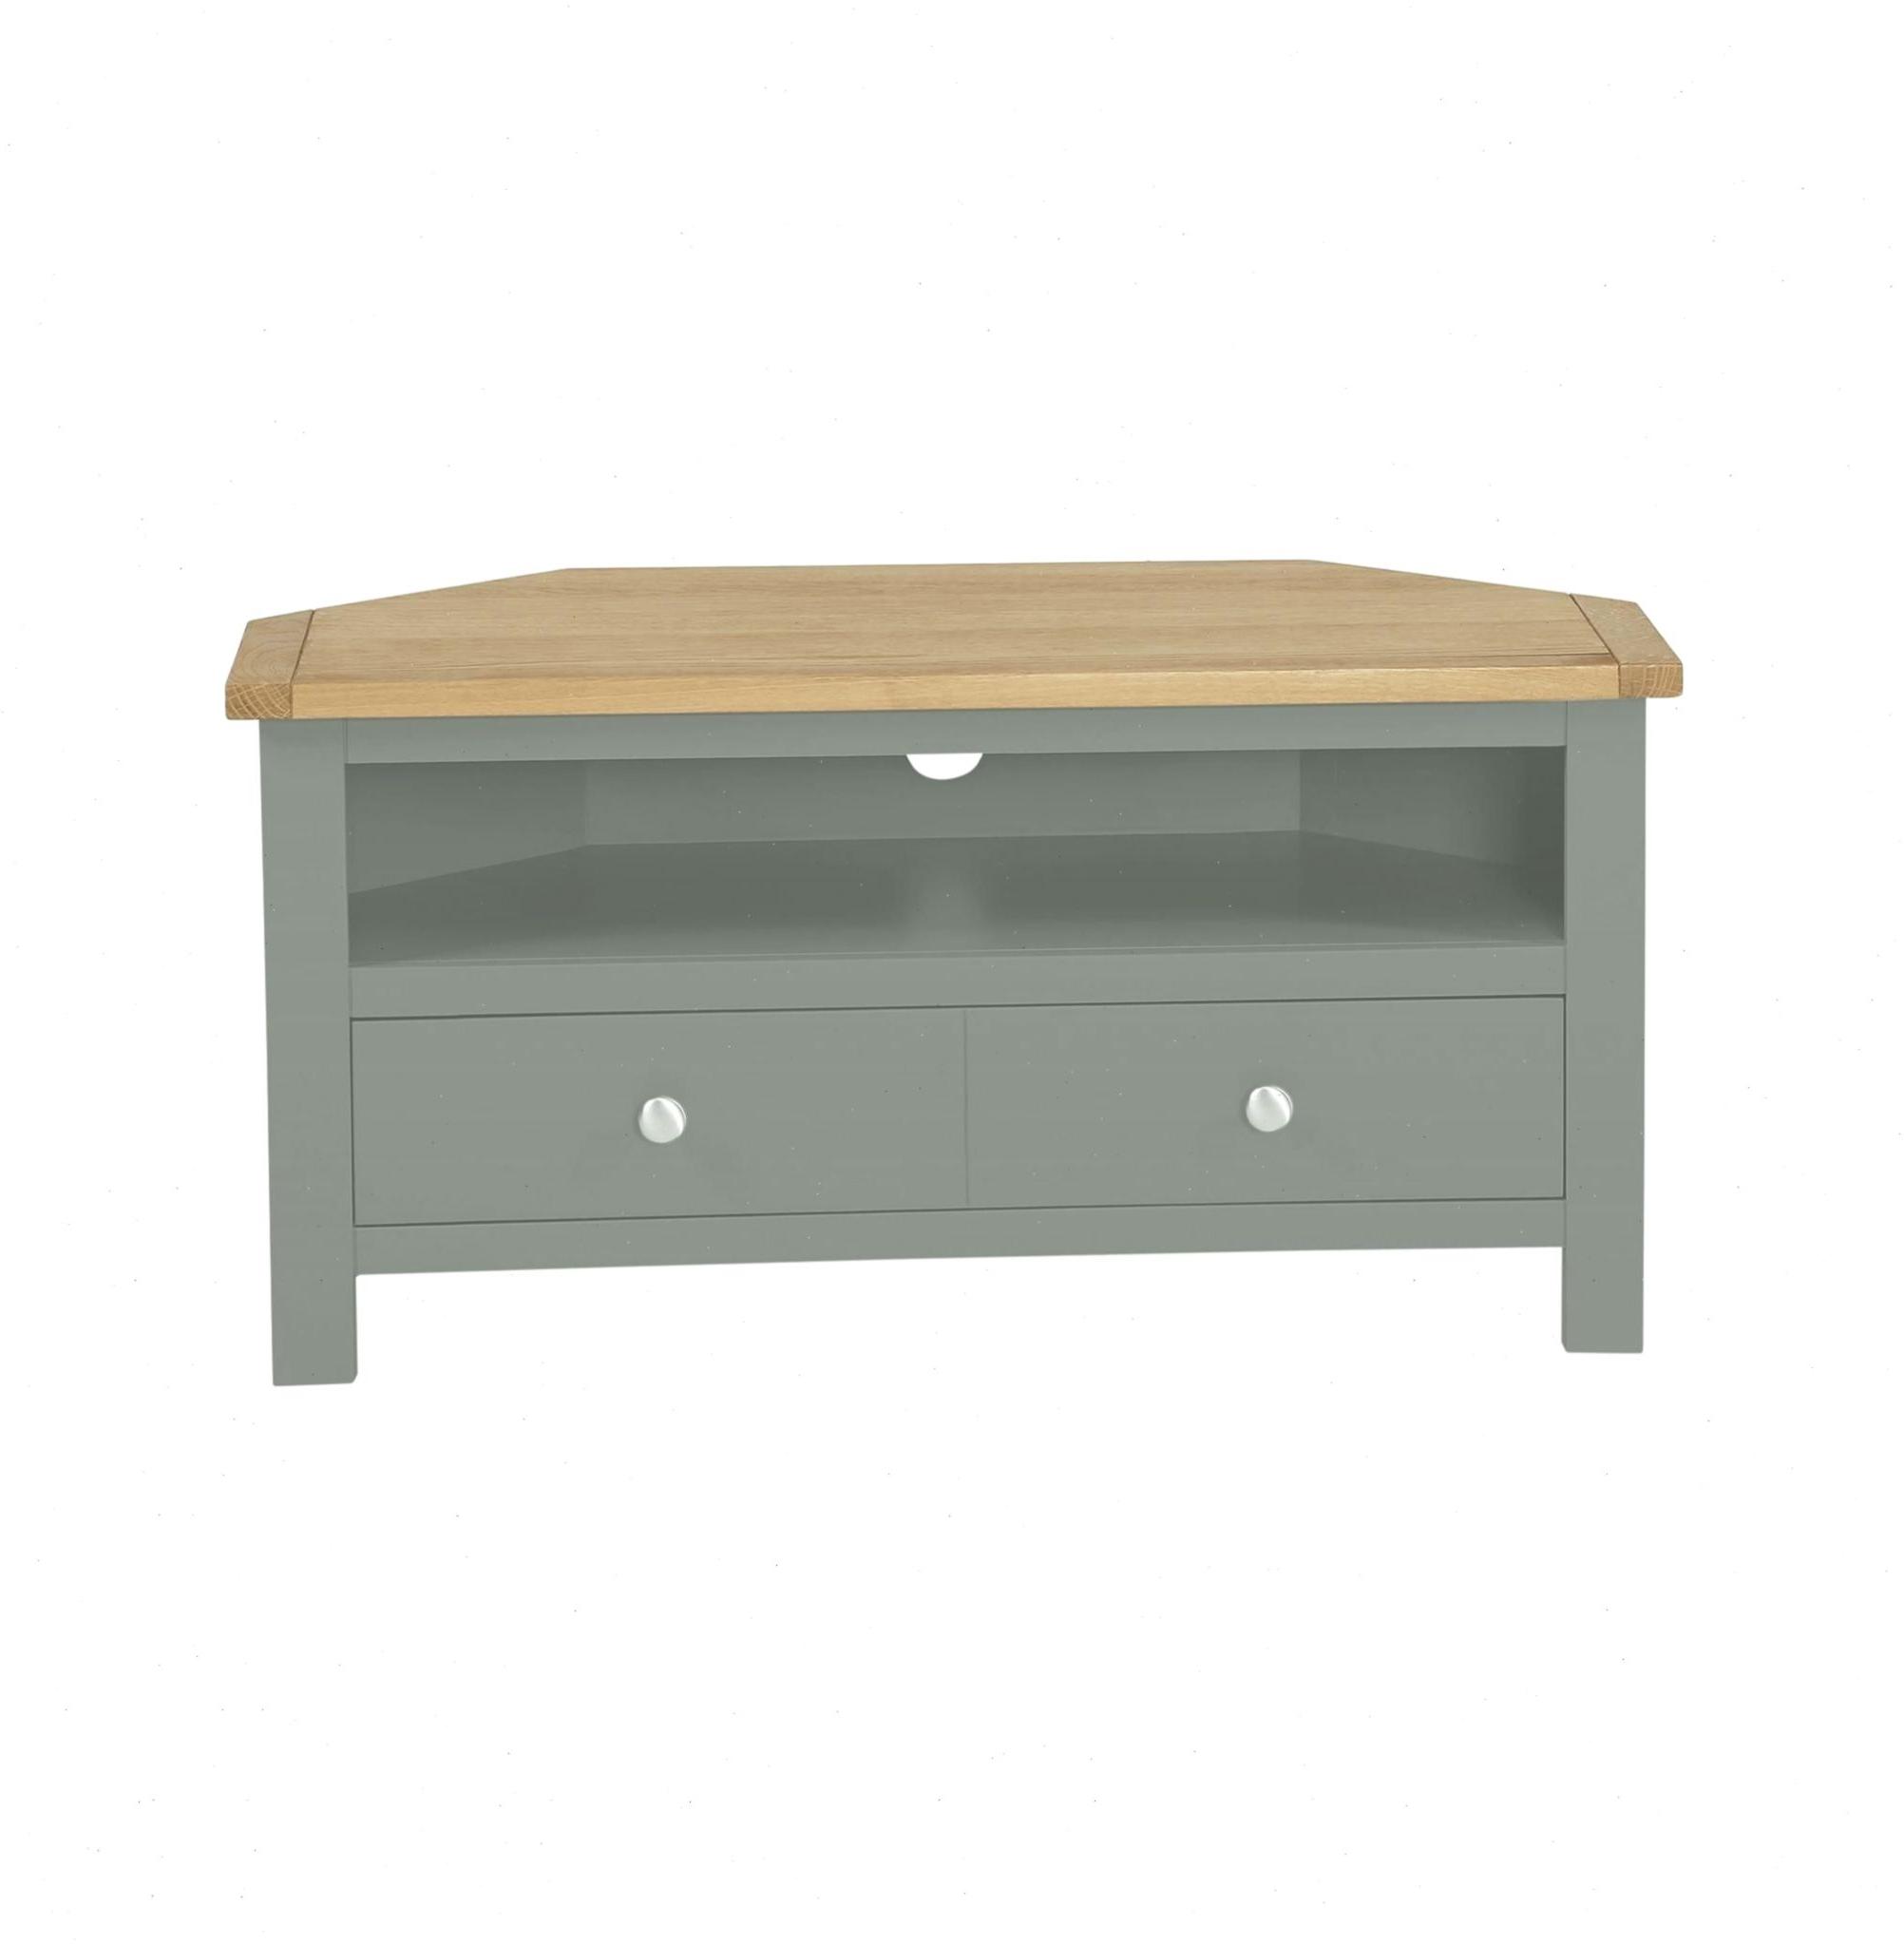 Ready Assembled Grey Living Room Furniture – Dlivingroomku Inside Bromley Grey Corner Tv Stands (View 2 of 20)